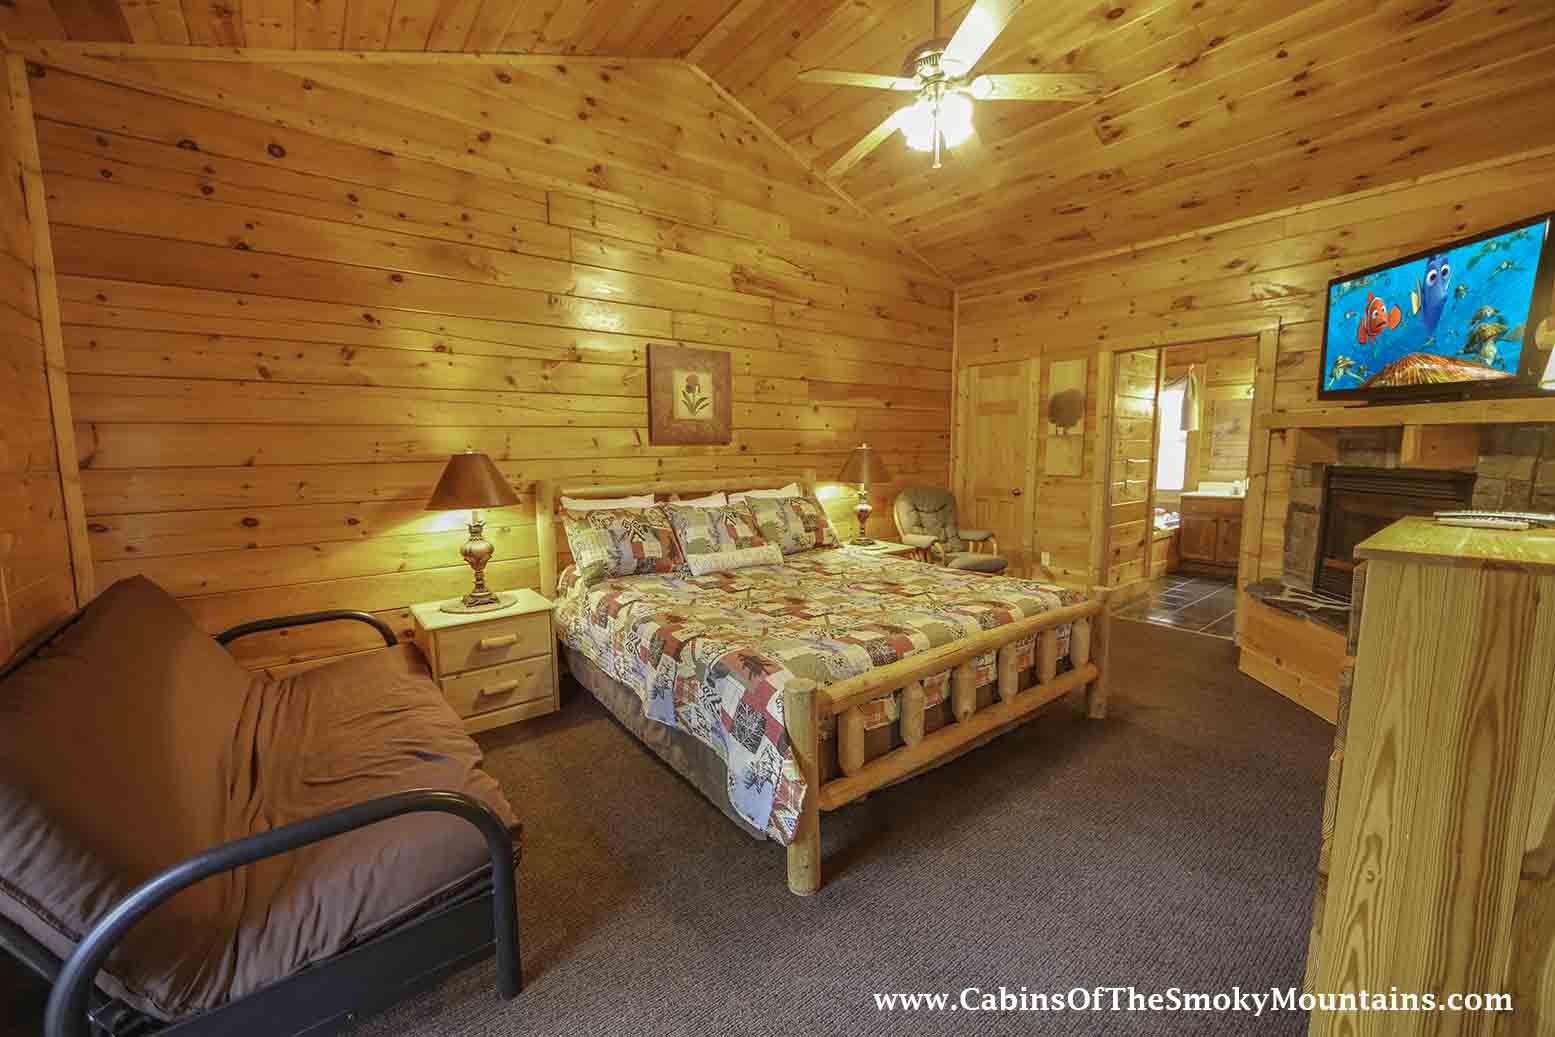 Pigeon Forge Cabin Big Bear Retreat 7 Bedroom Sleeps 30 Jacuzzi Bunk Beds Swimming